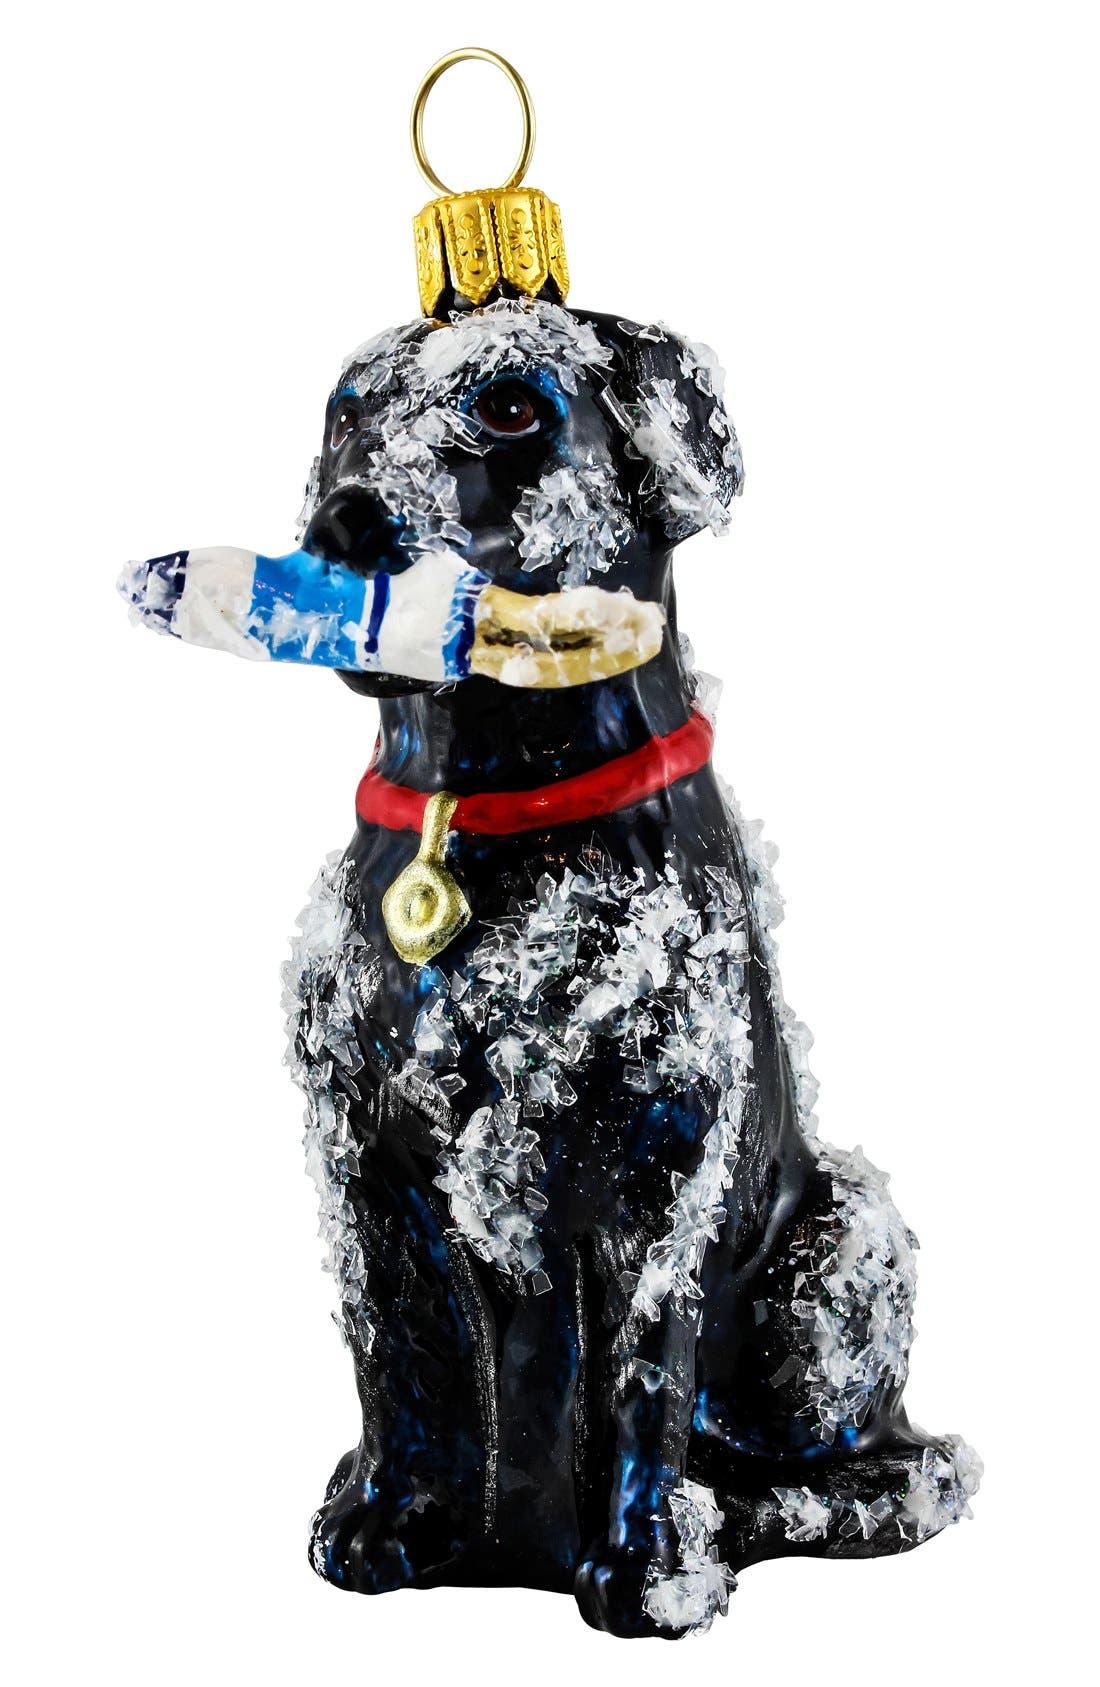 'Labrador with Buoy' Ornament,                             Main thumbnail 1, color,                             BLACK LABRADOR